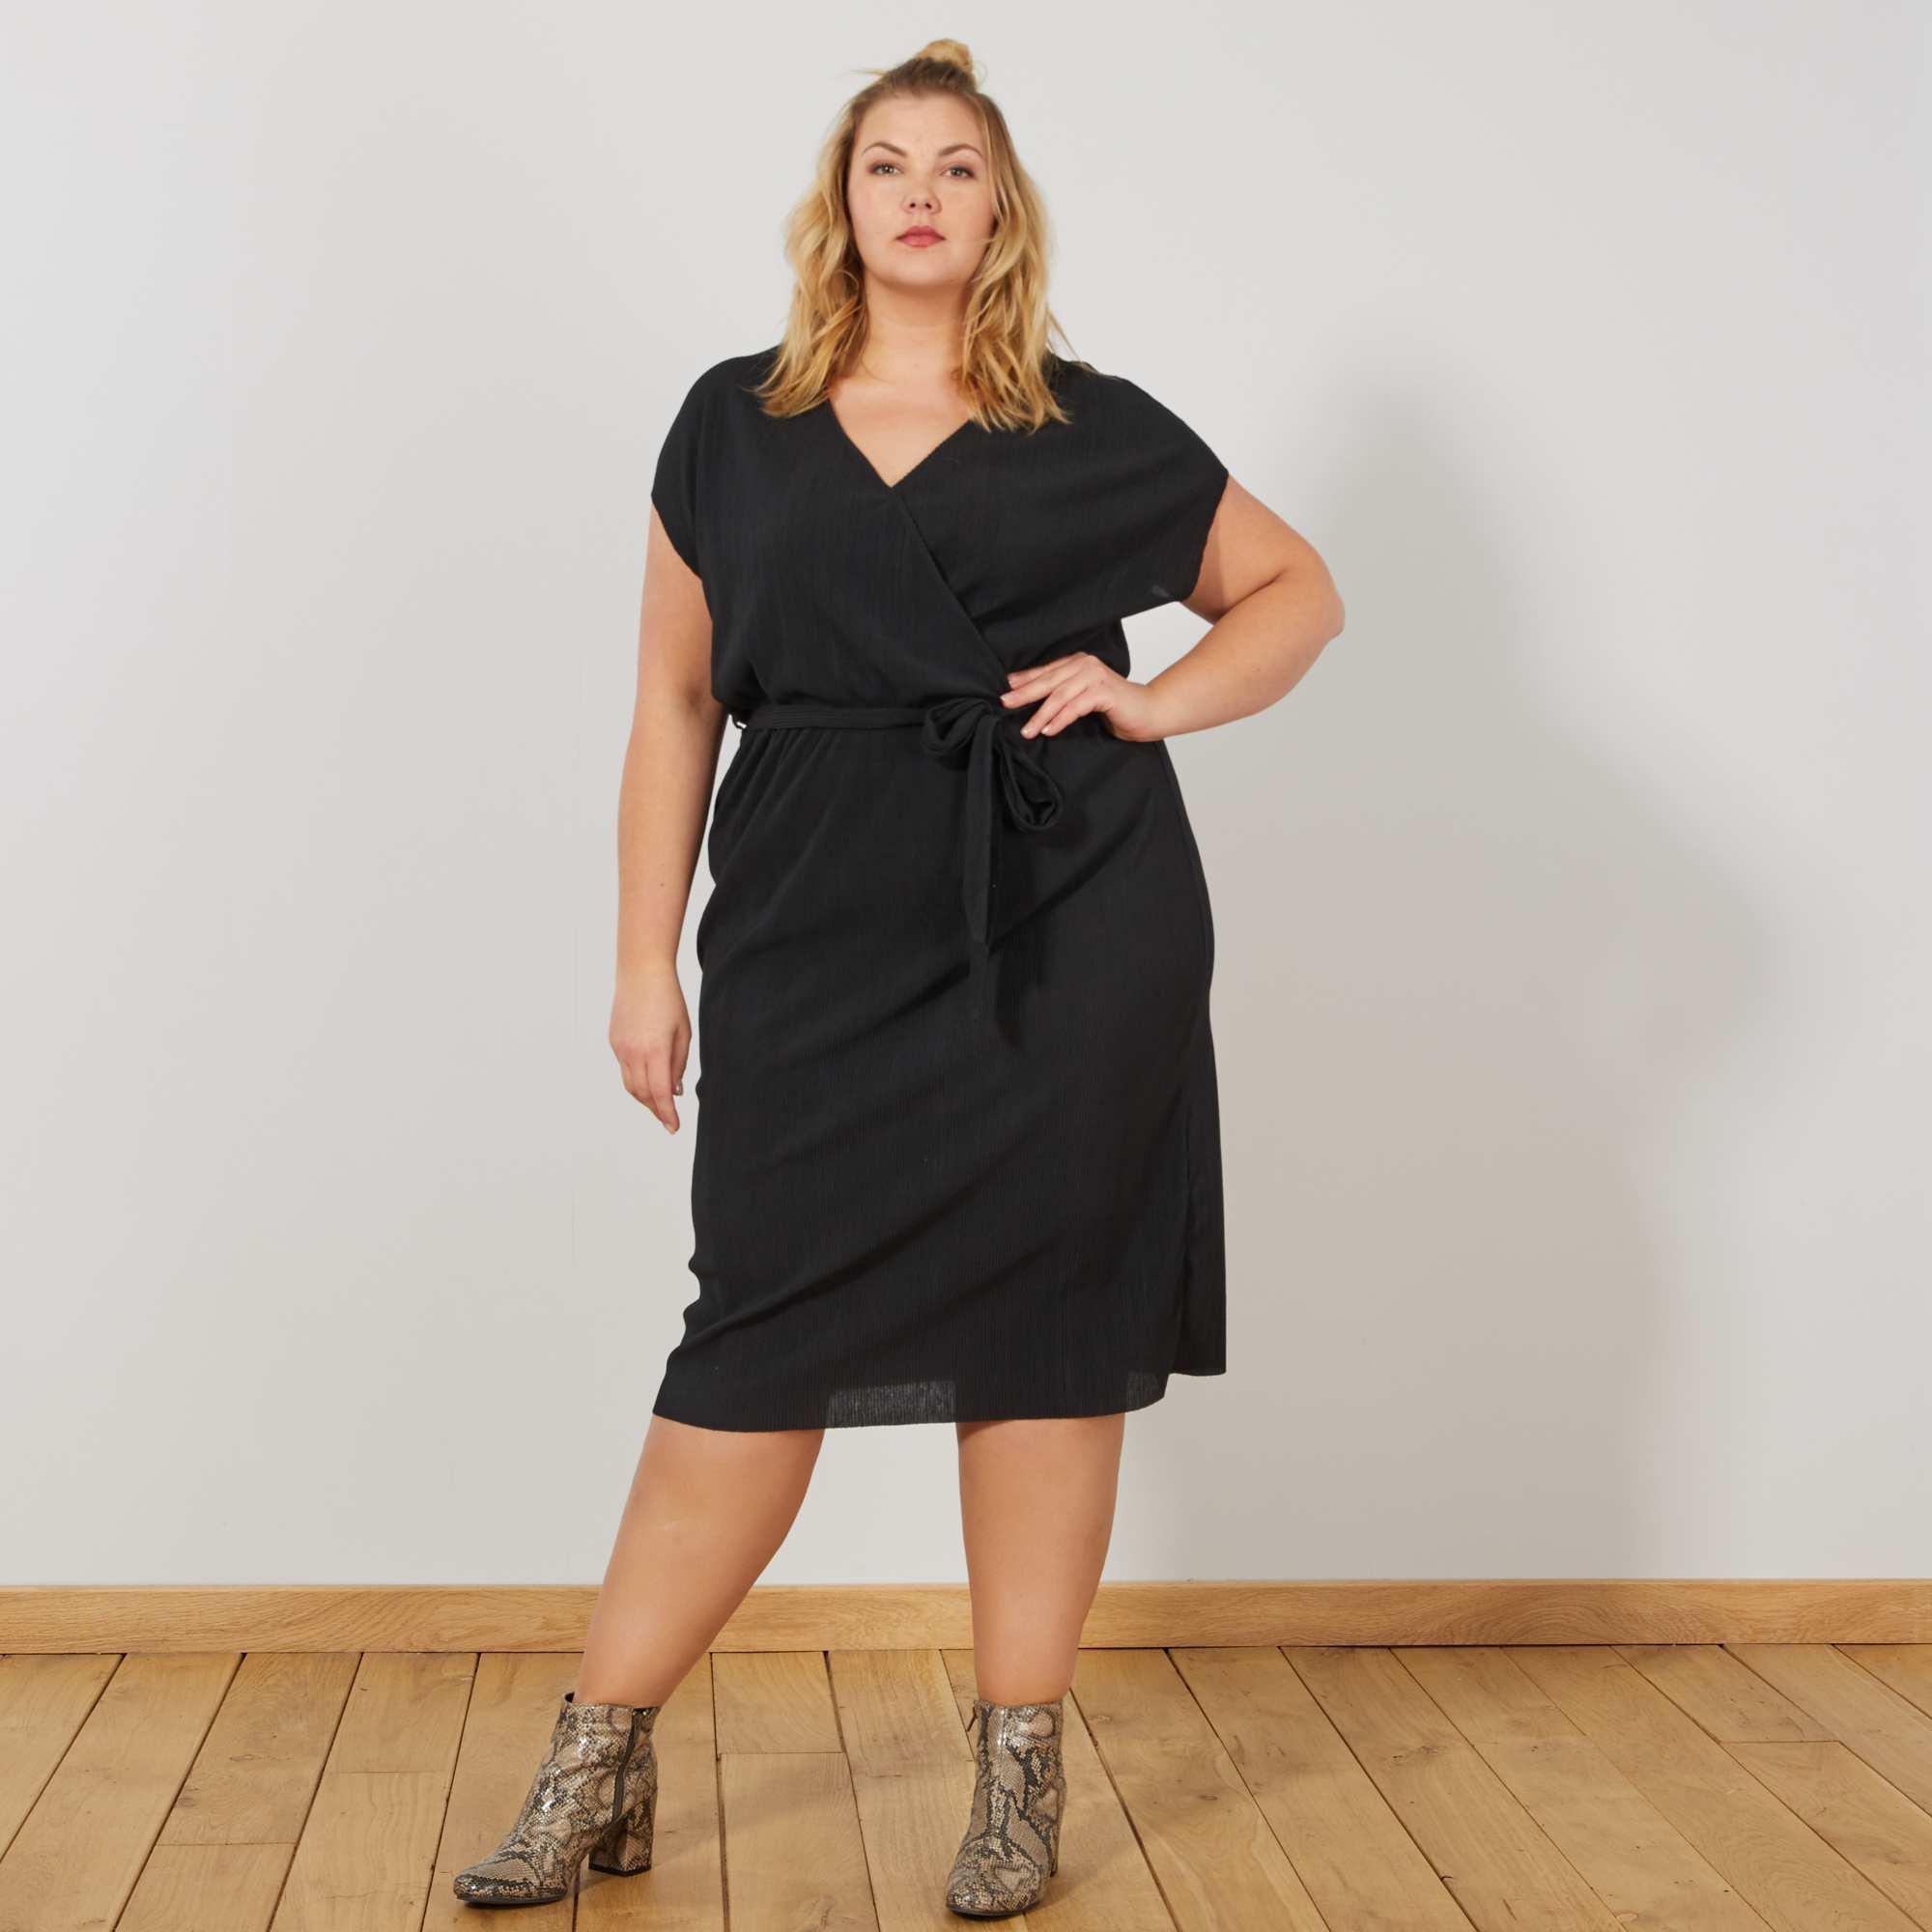 50de189bb43 Robe style portefeuille Grande taille femme - noir - Kiabi - 15